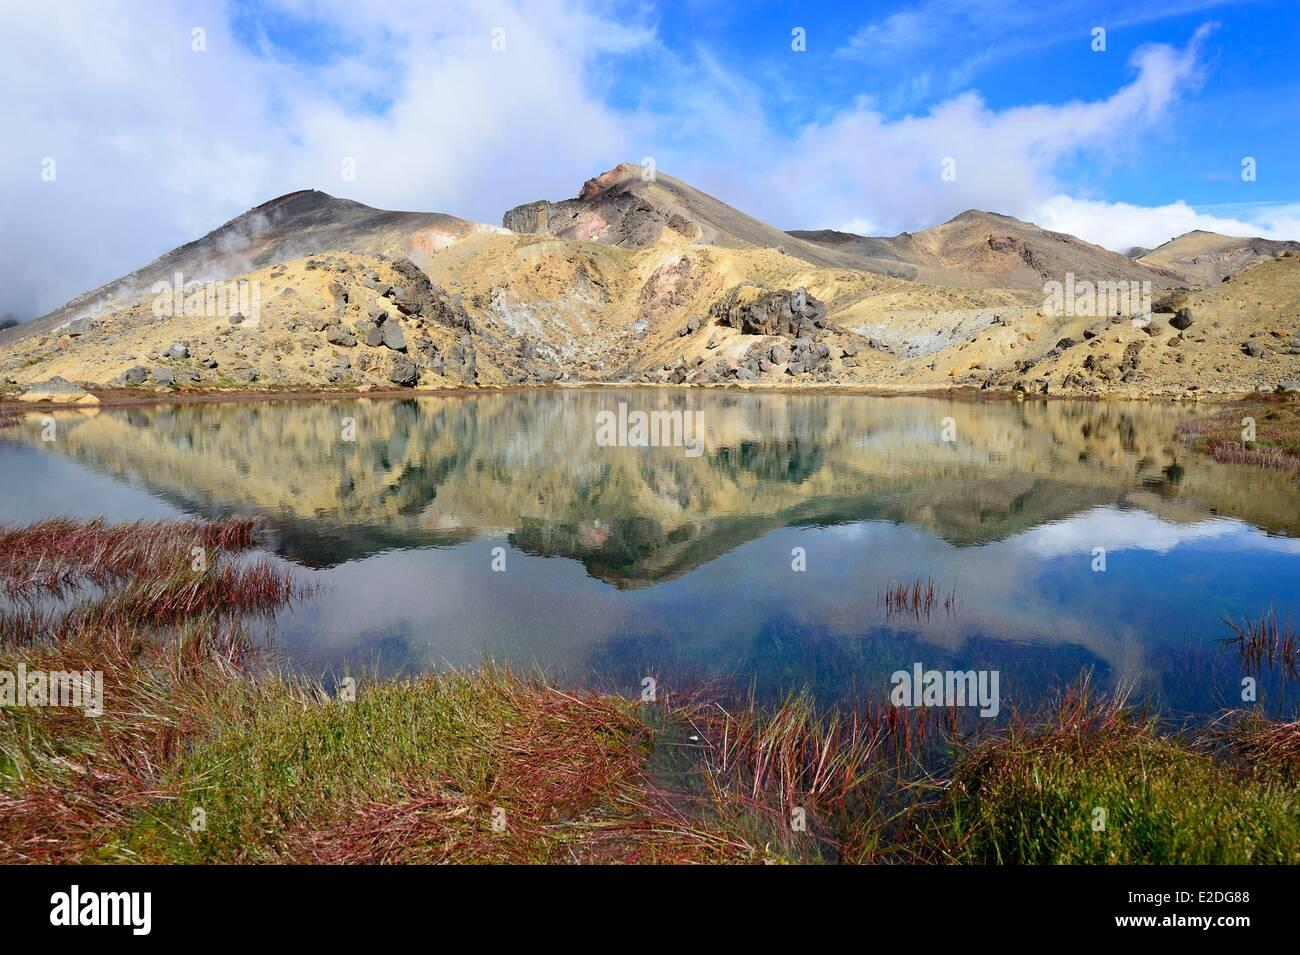 New Zealand North Island Tongariro National Park is the first national park in New Zealand and the fourth to emerge - Stock Image